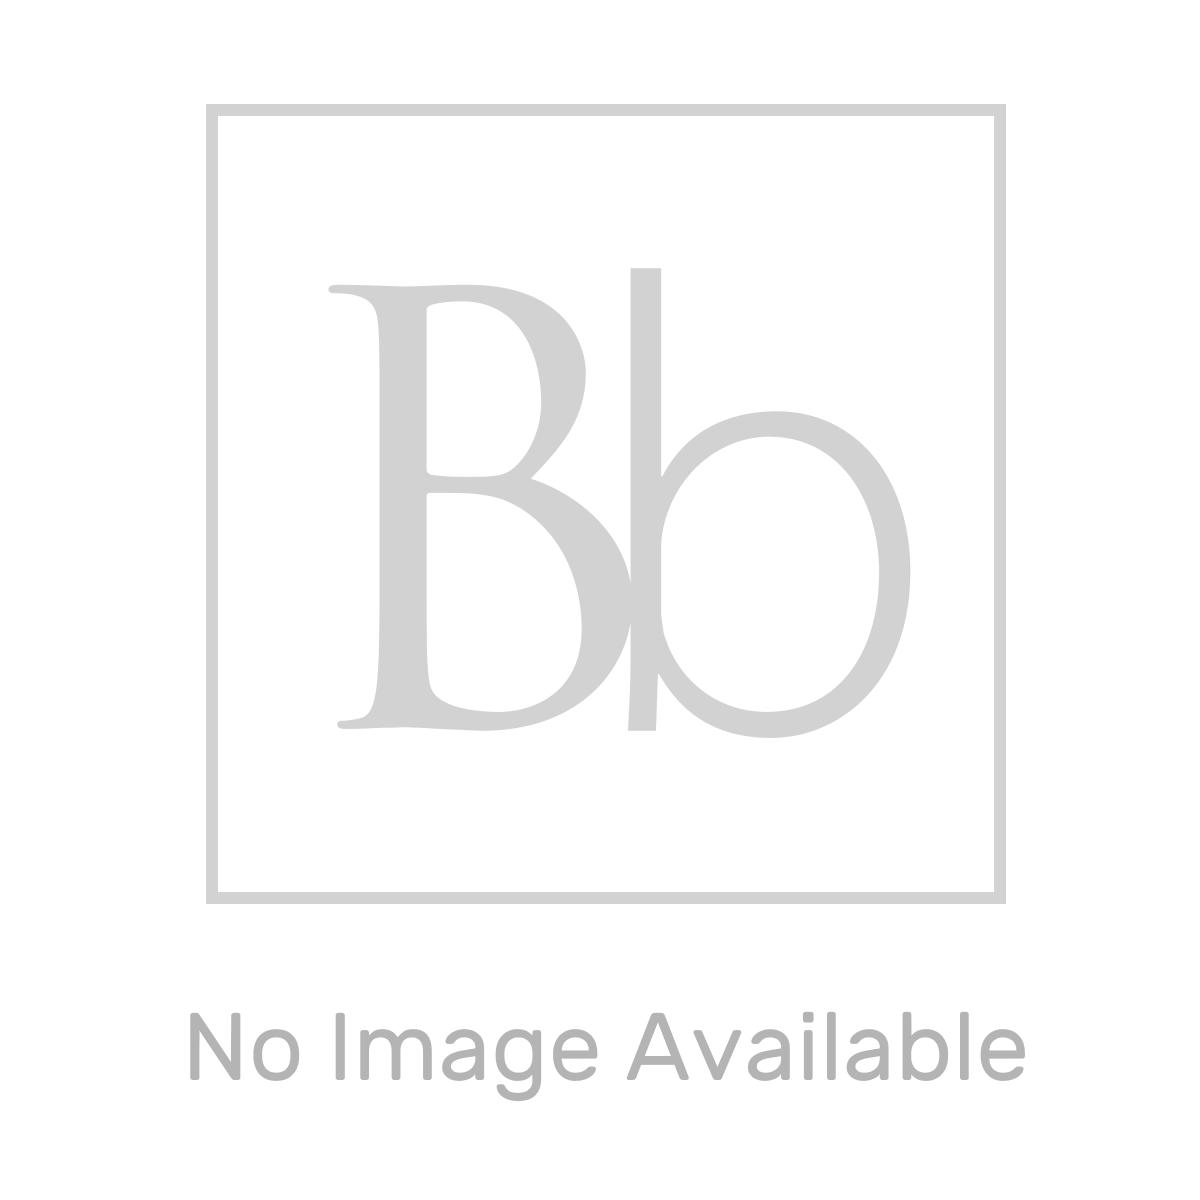 RAK Surface Mid Grey Lappato Tile 750 x 750mm